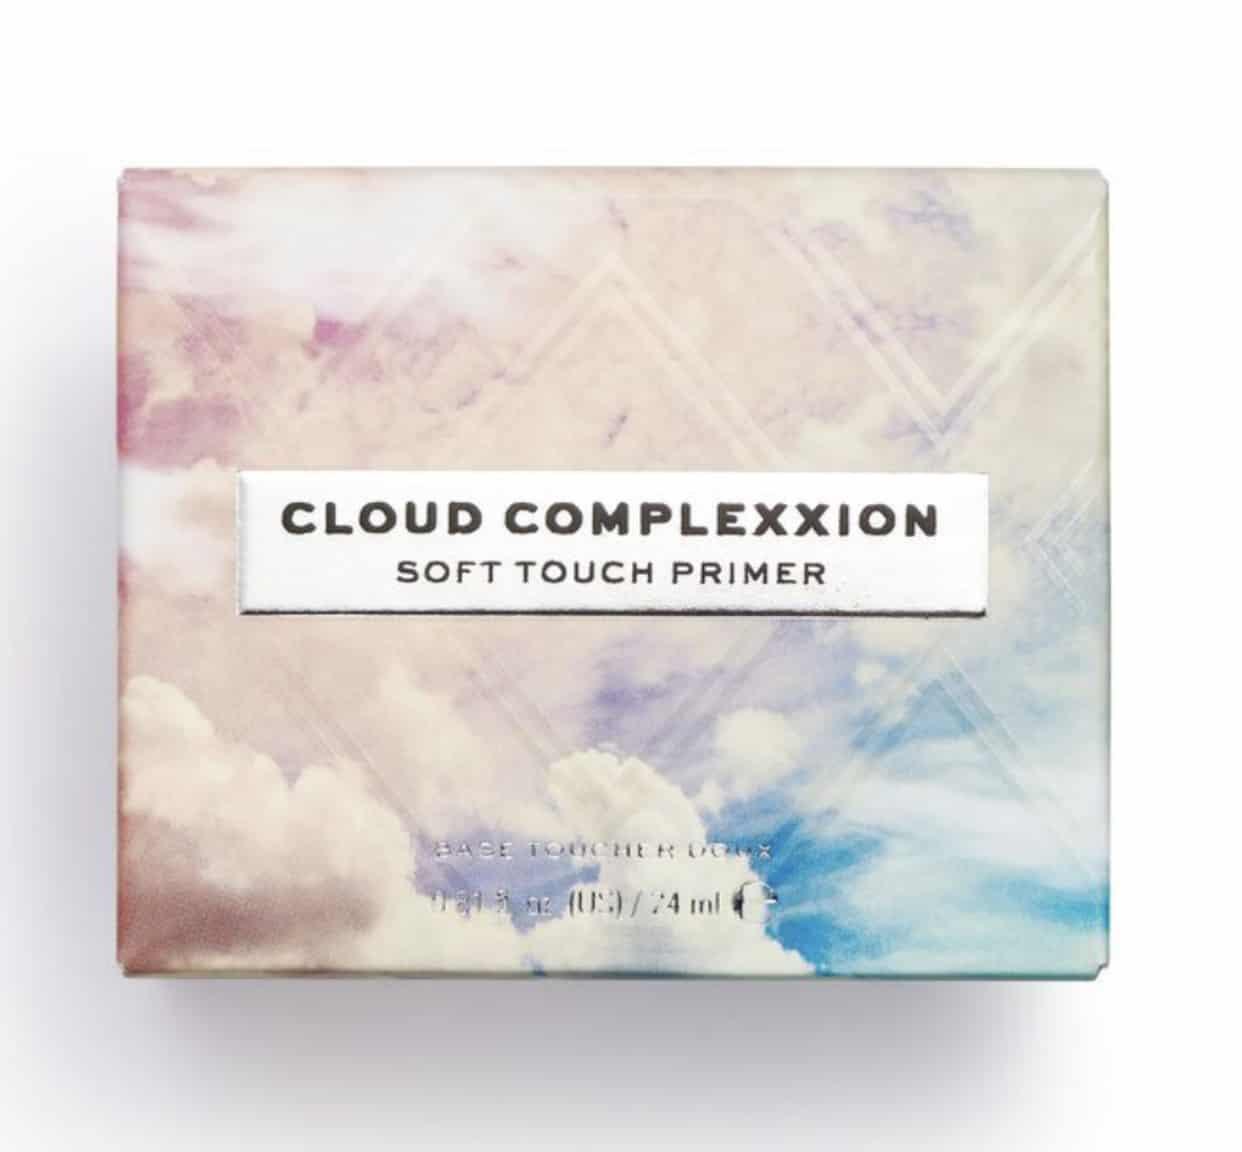 XX Revolution Cloud Complexxion Soft Touch Primer